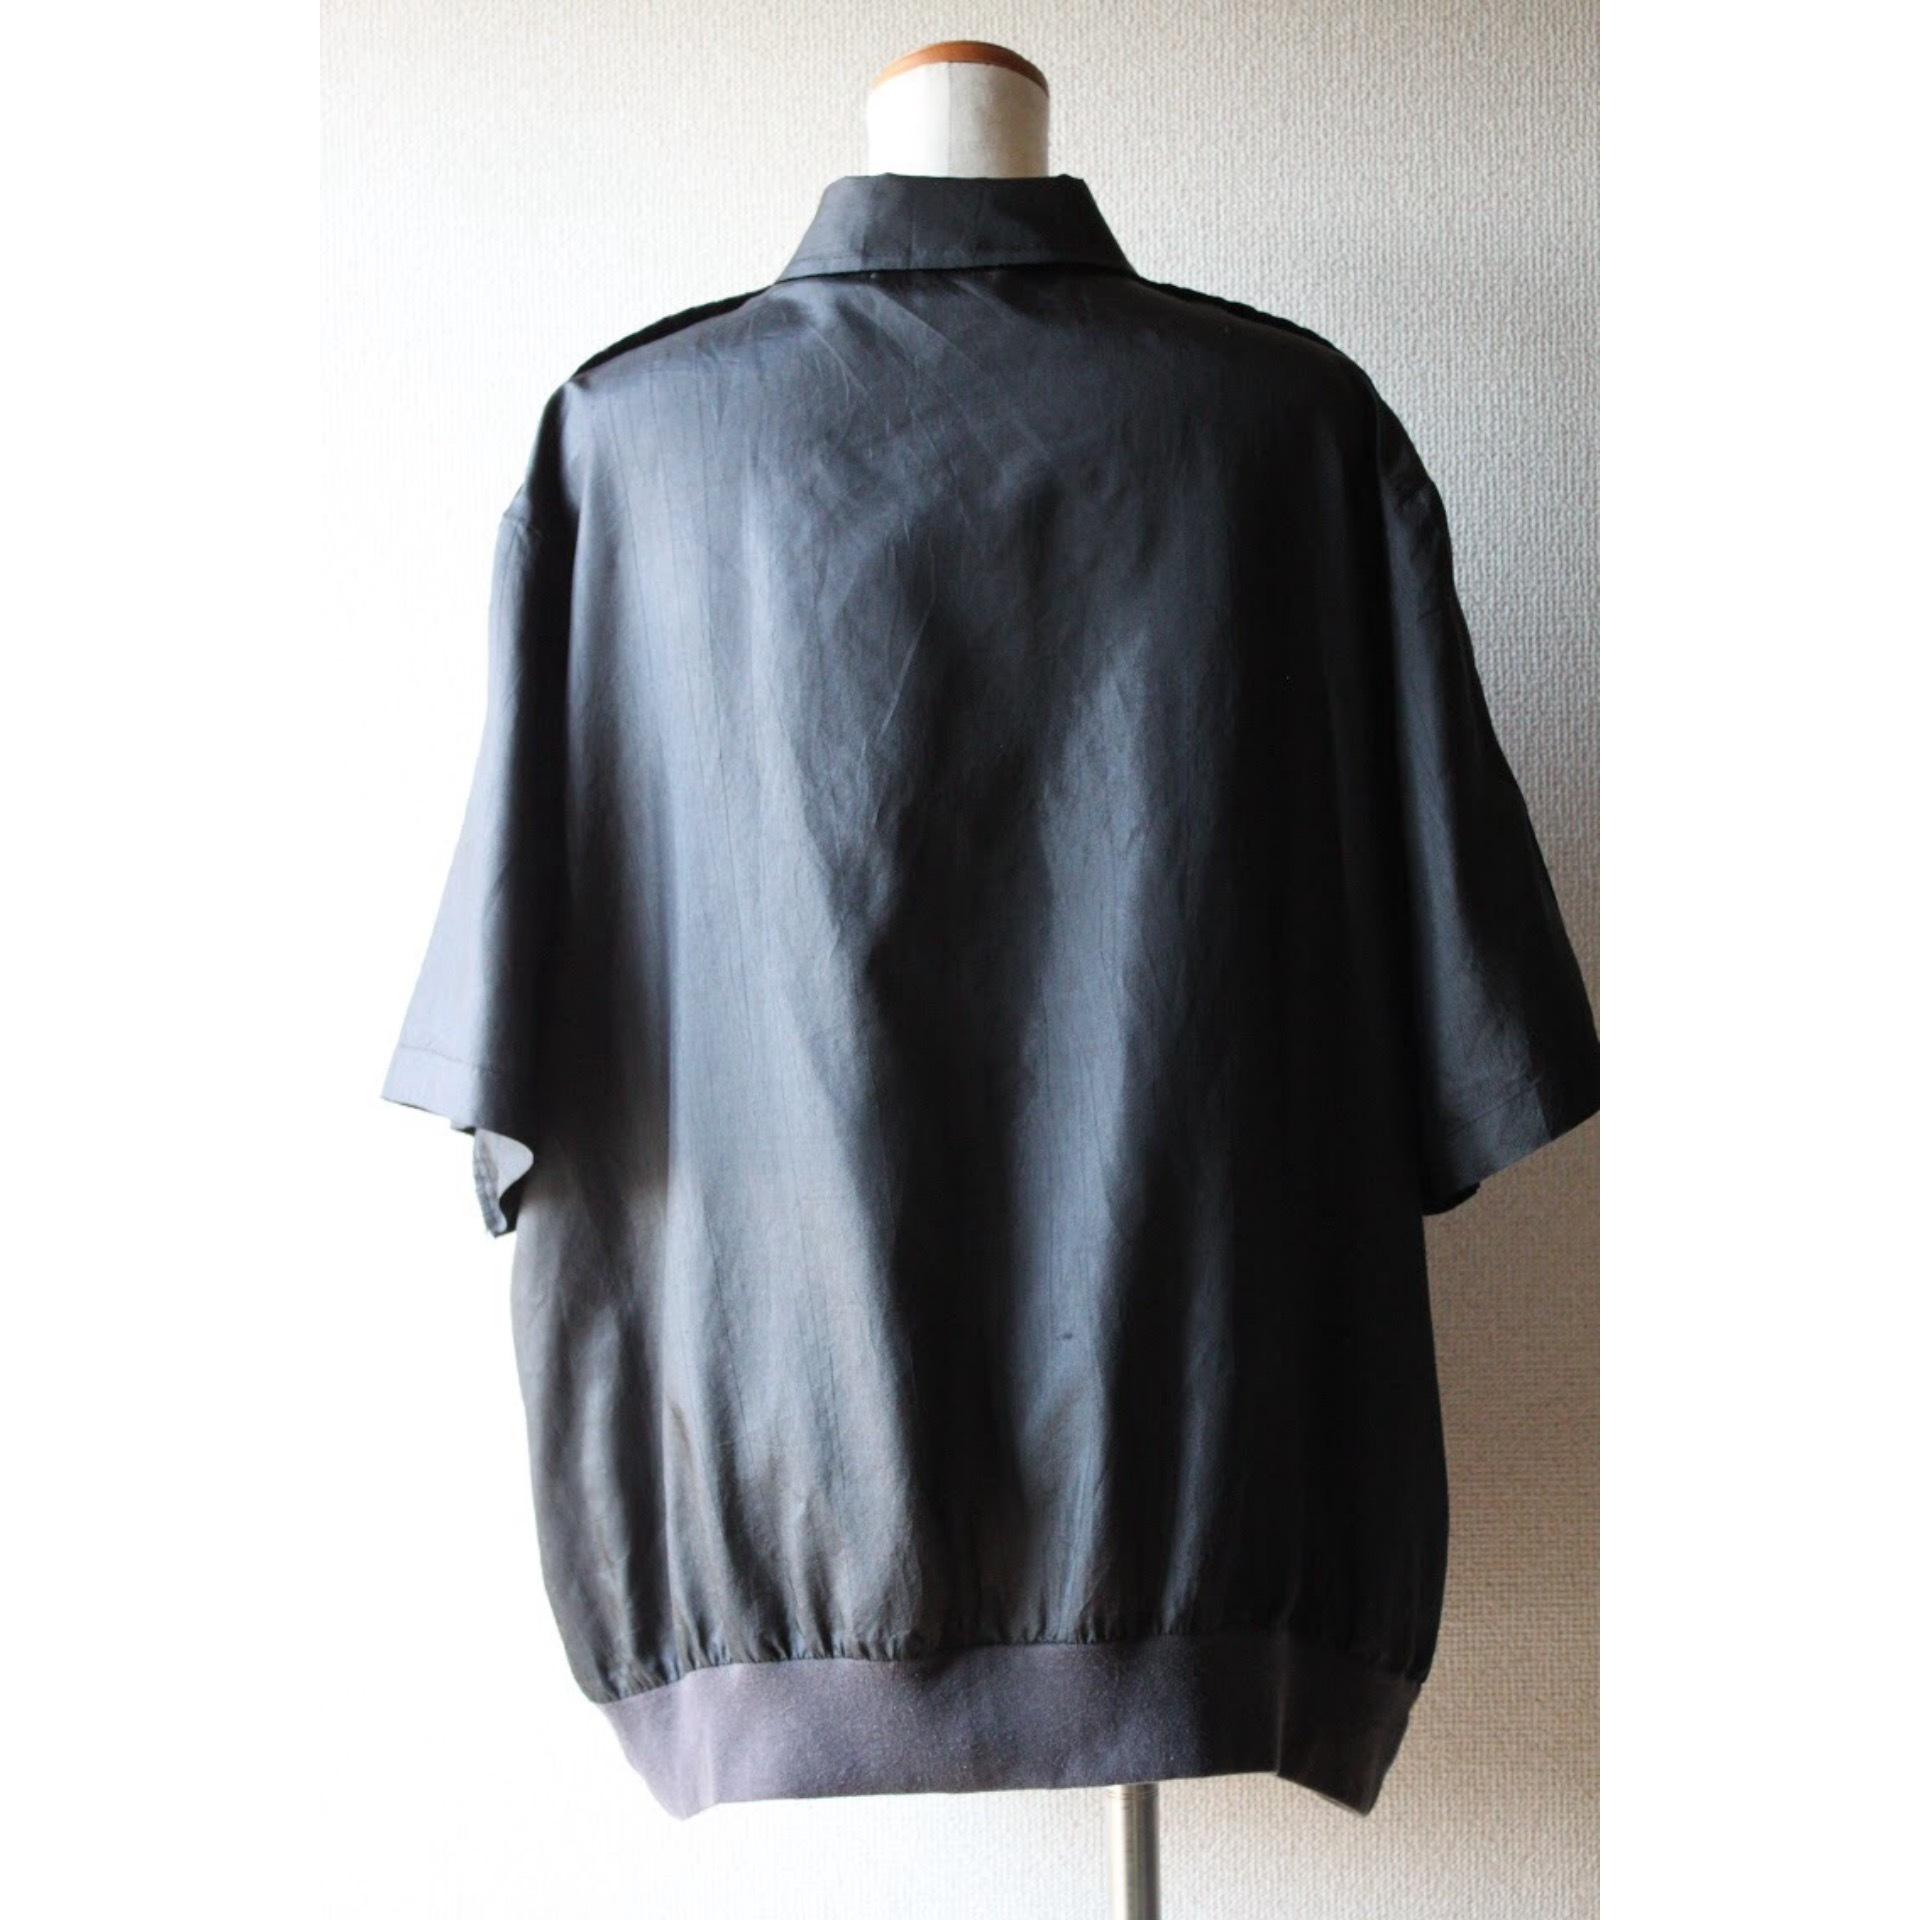 Vintage pullover shirt